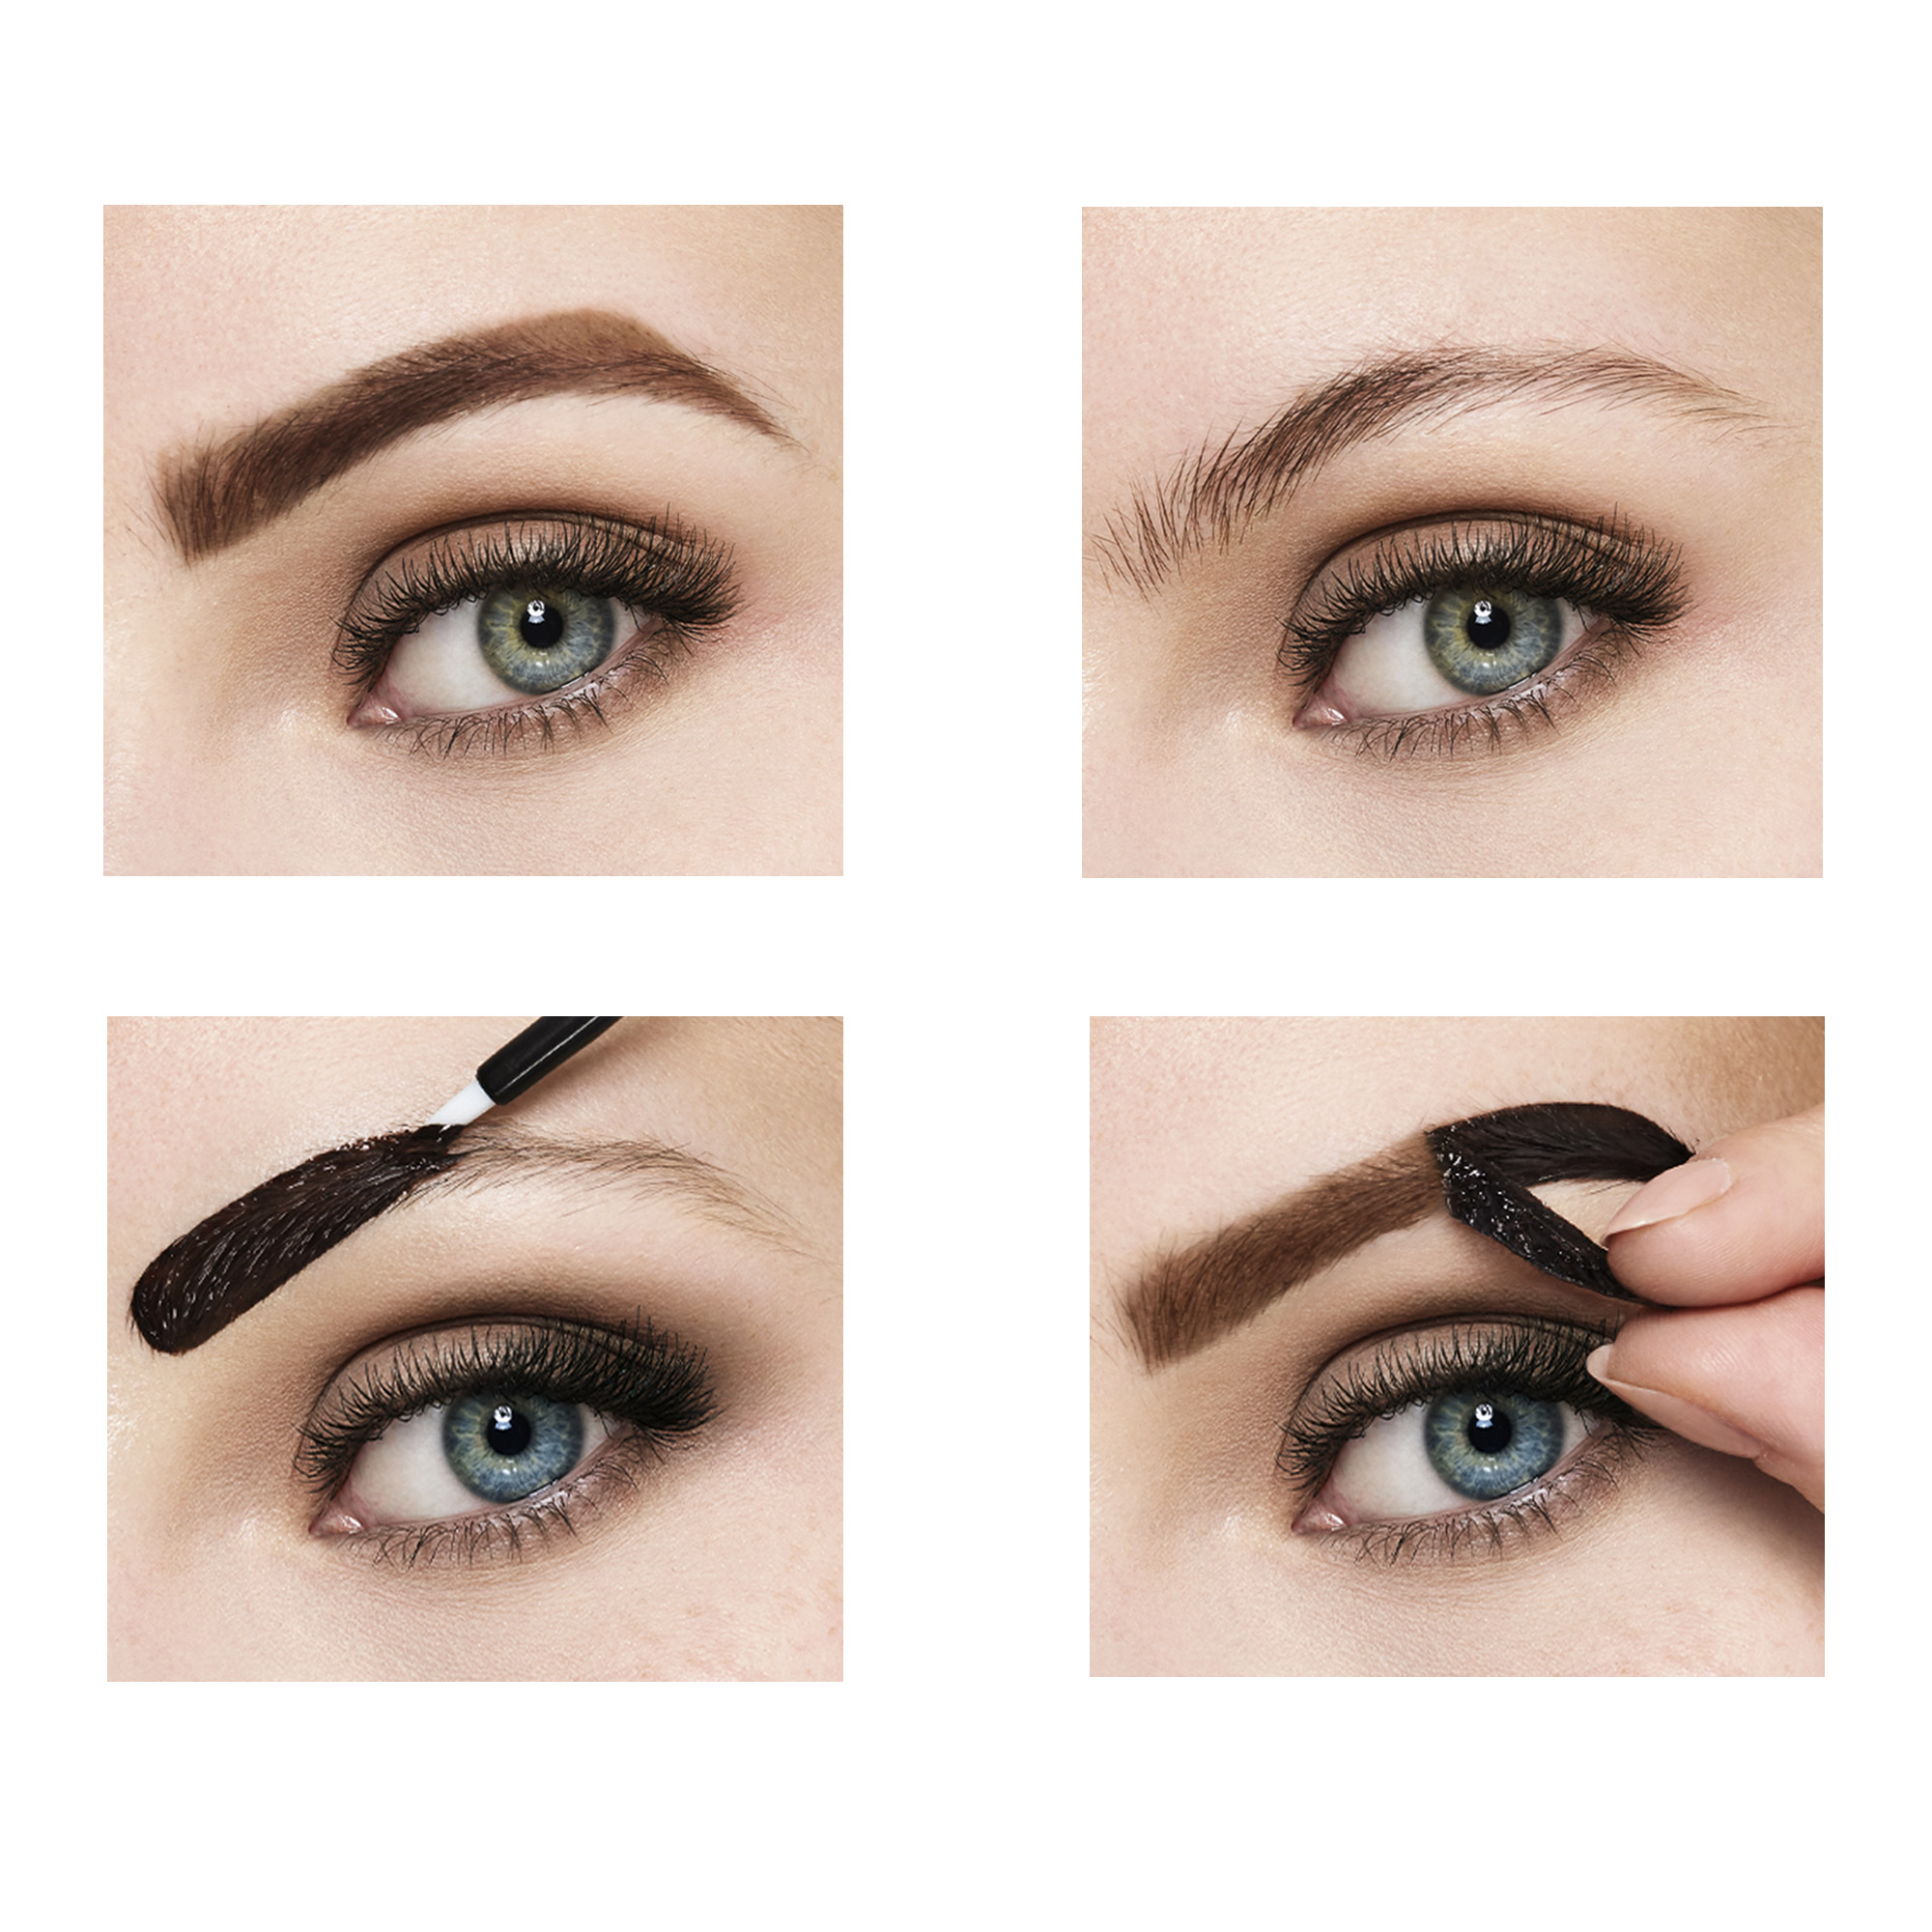 comprar maybelline tinte semipermanente peel off tattoo brow casta o oscuro ojos cejas. Black Bedroom Furniture Sets. Home Design Ideas